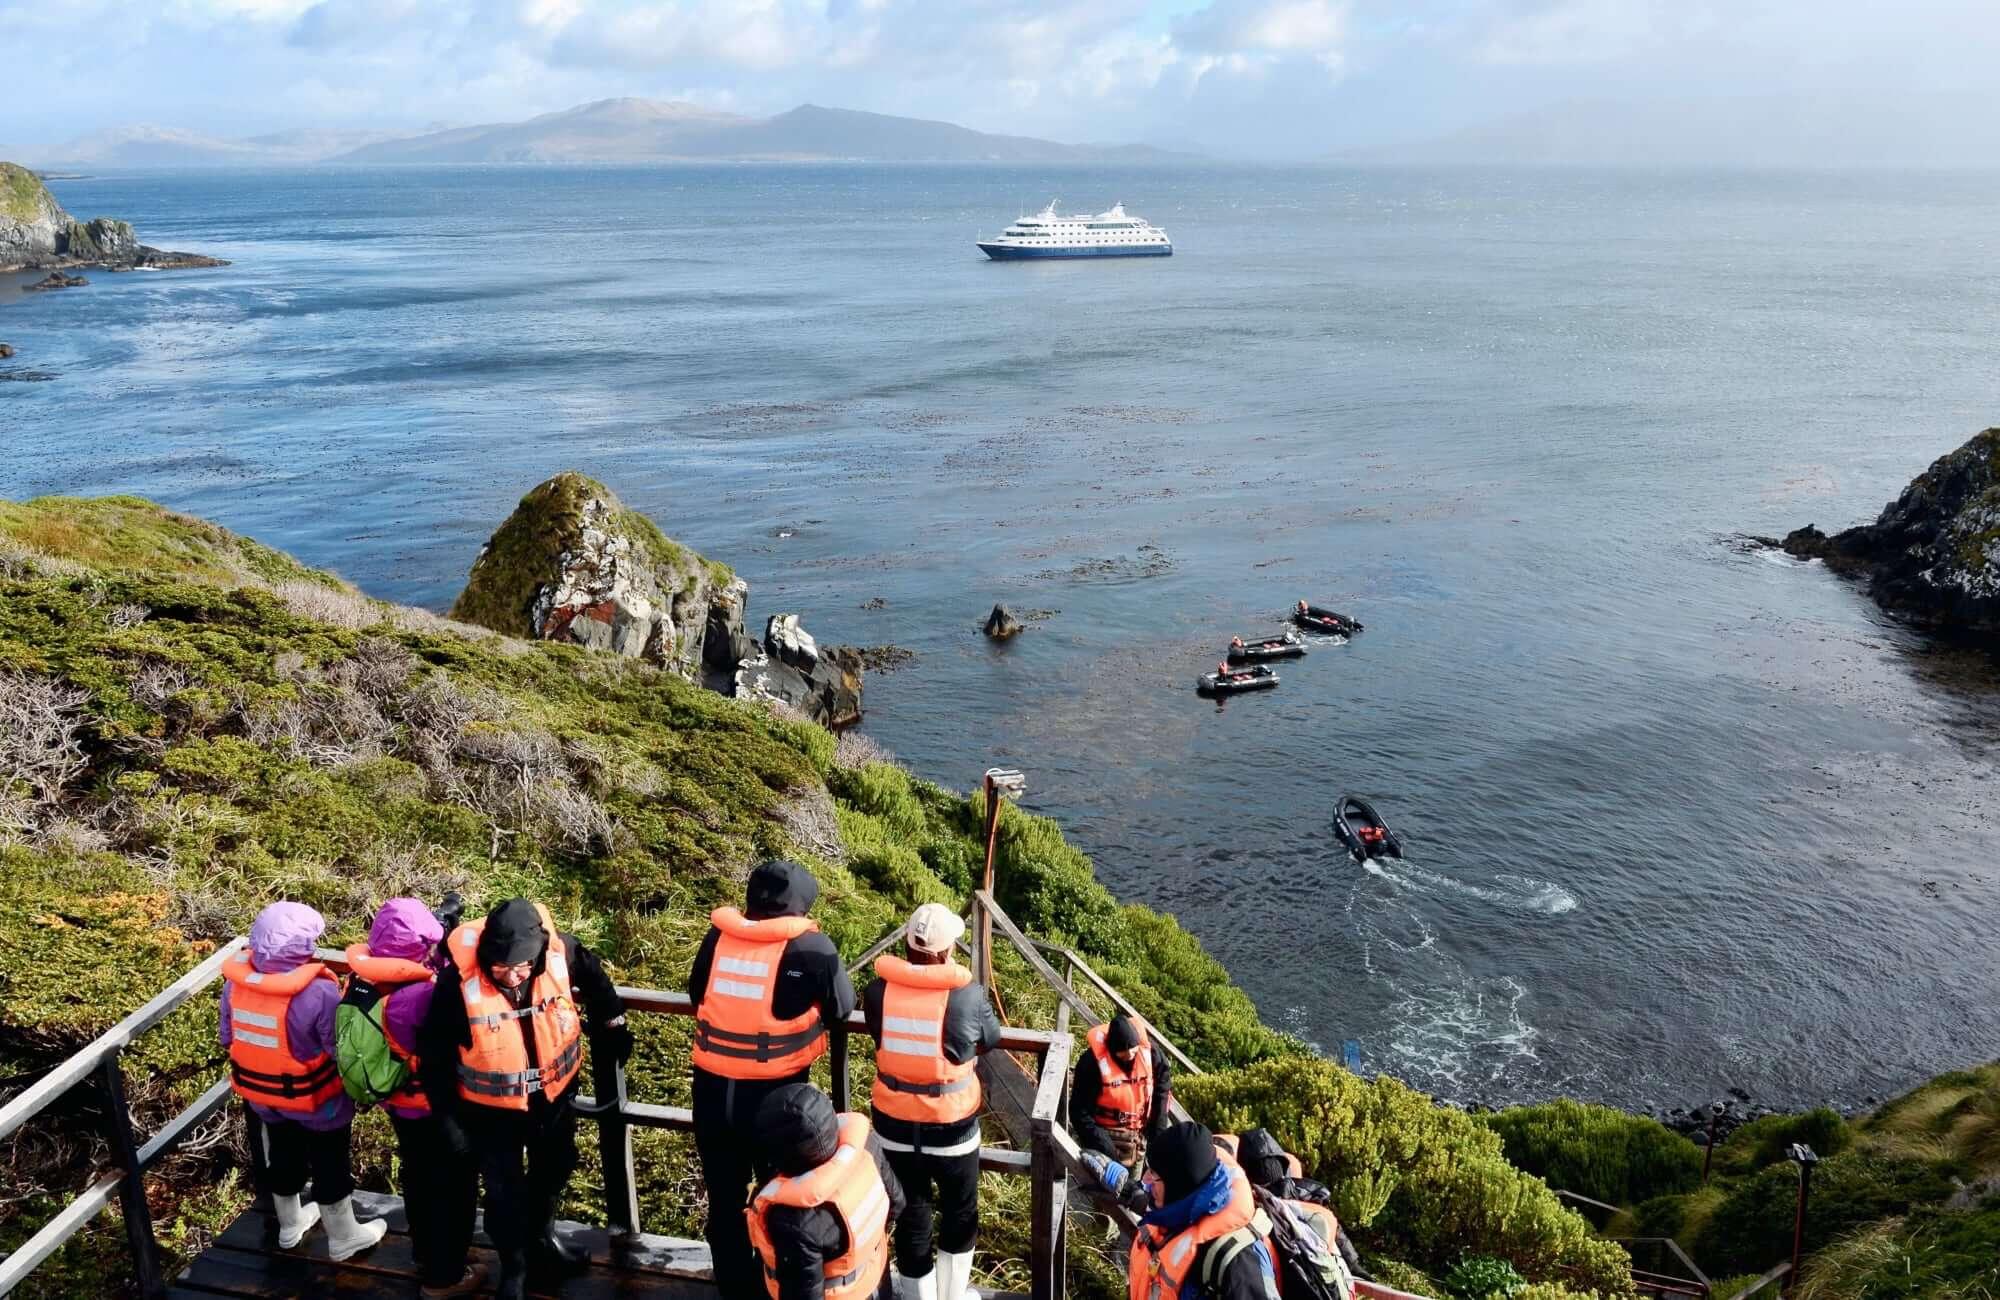 Cape Horn Australis Cruises, Chile